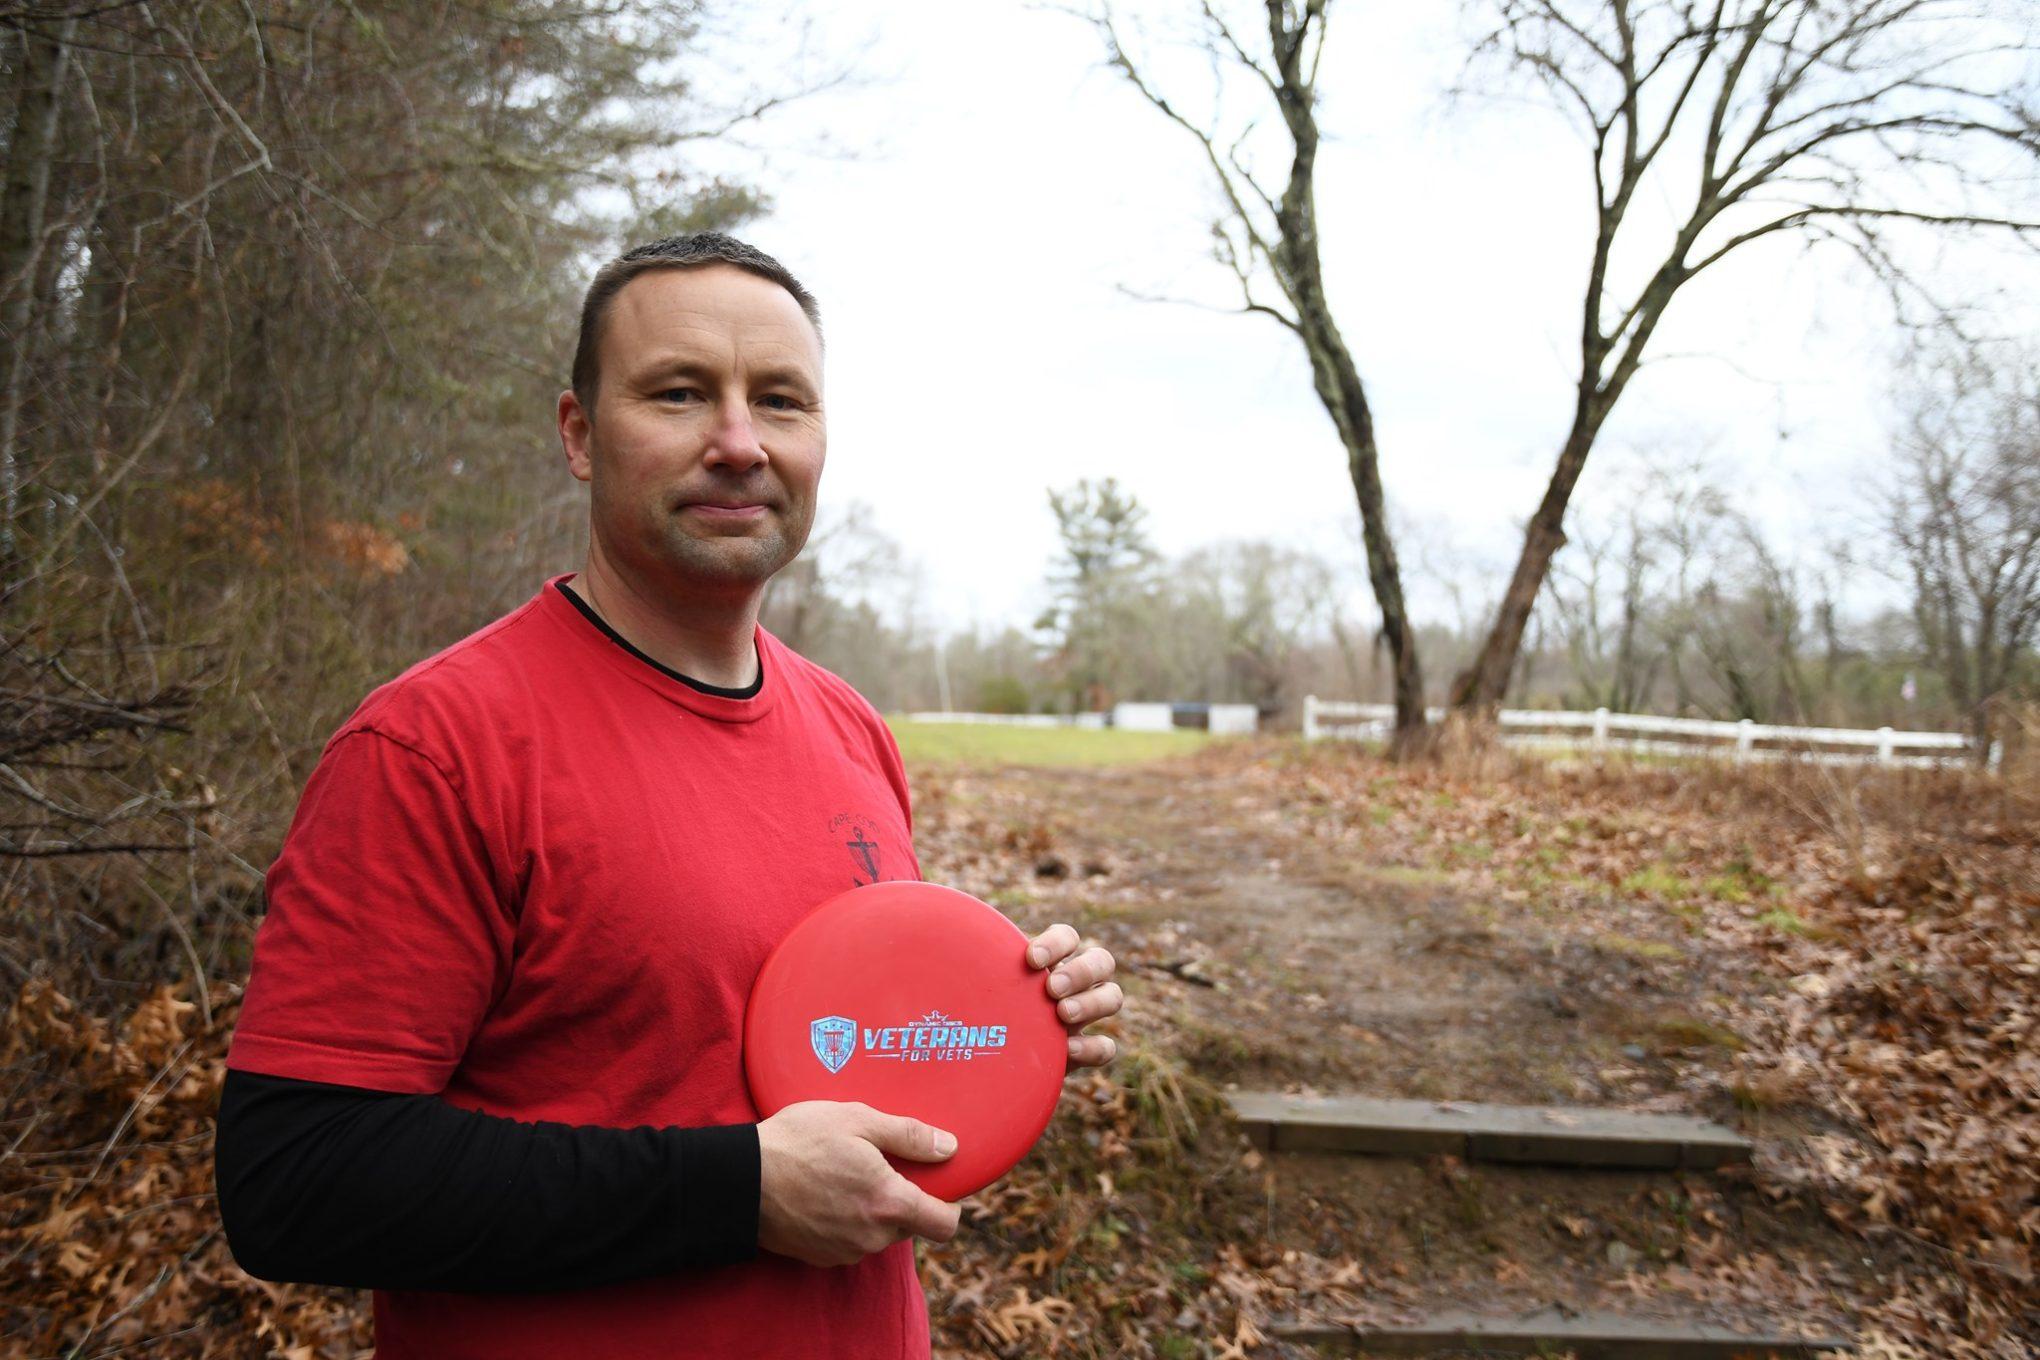 Michael Judin, Vice President of Cape Cod Disc Golf Club